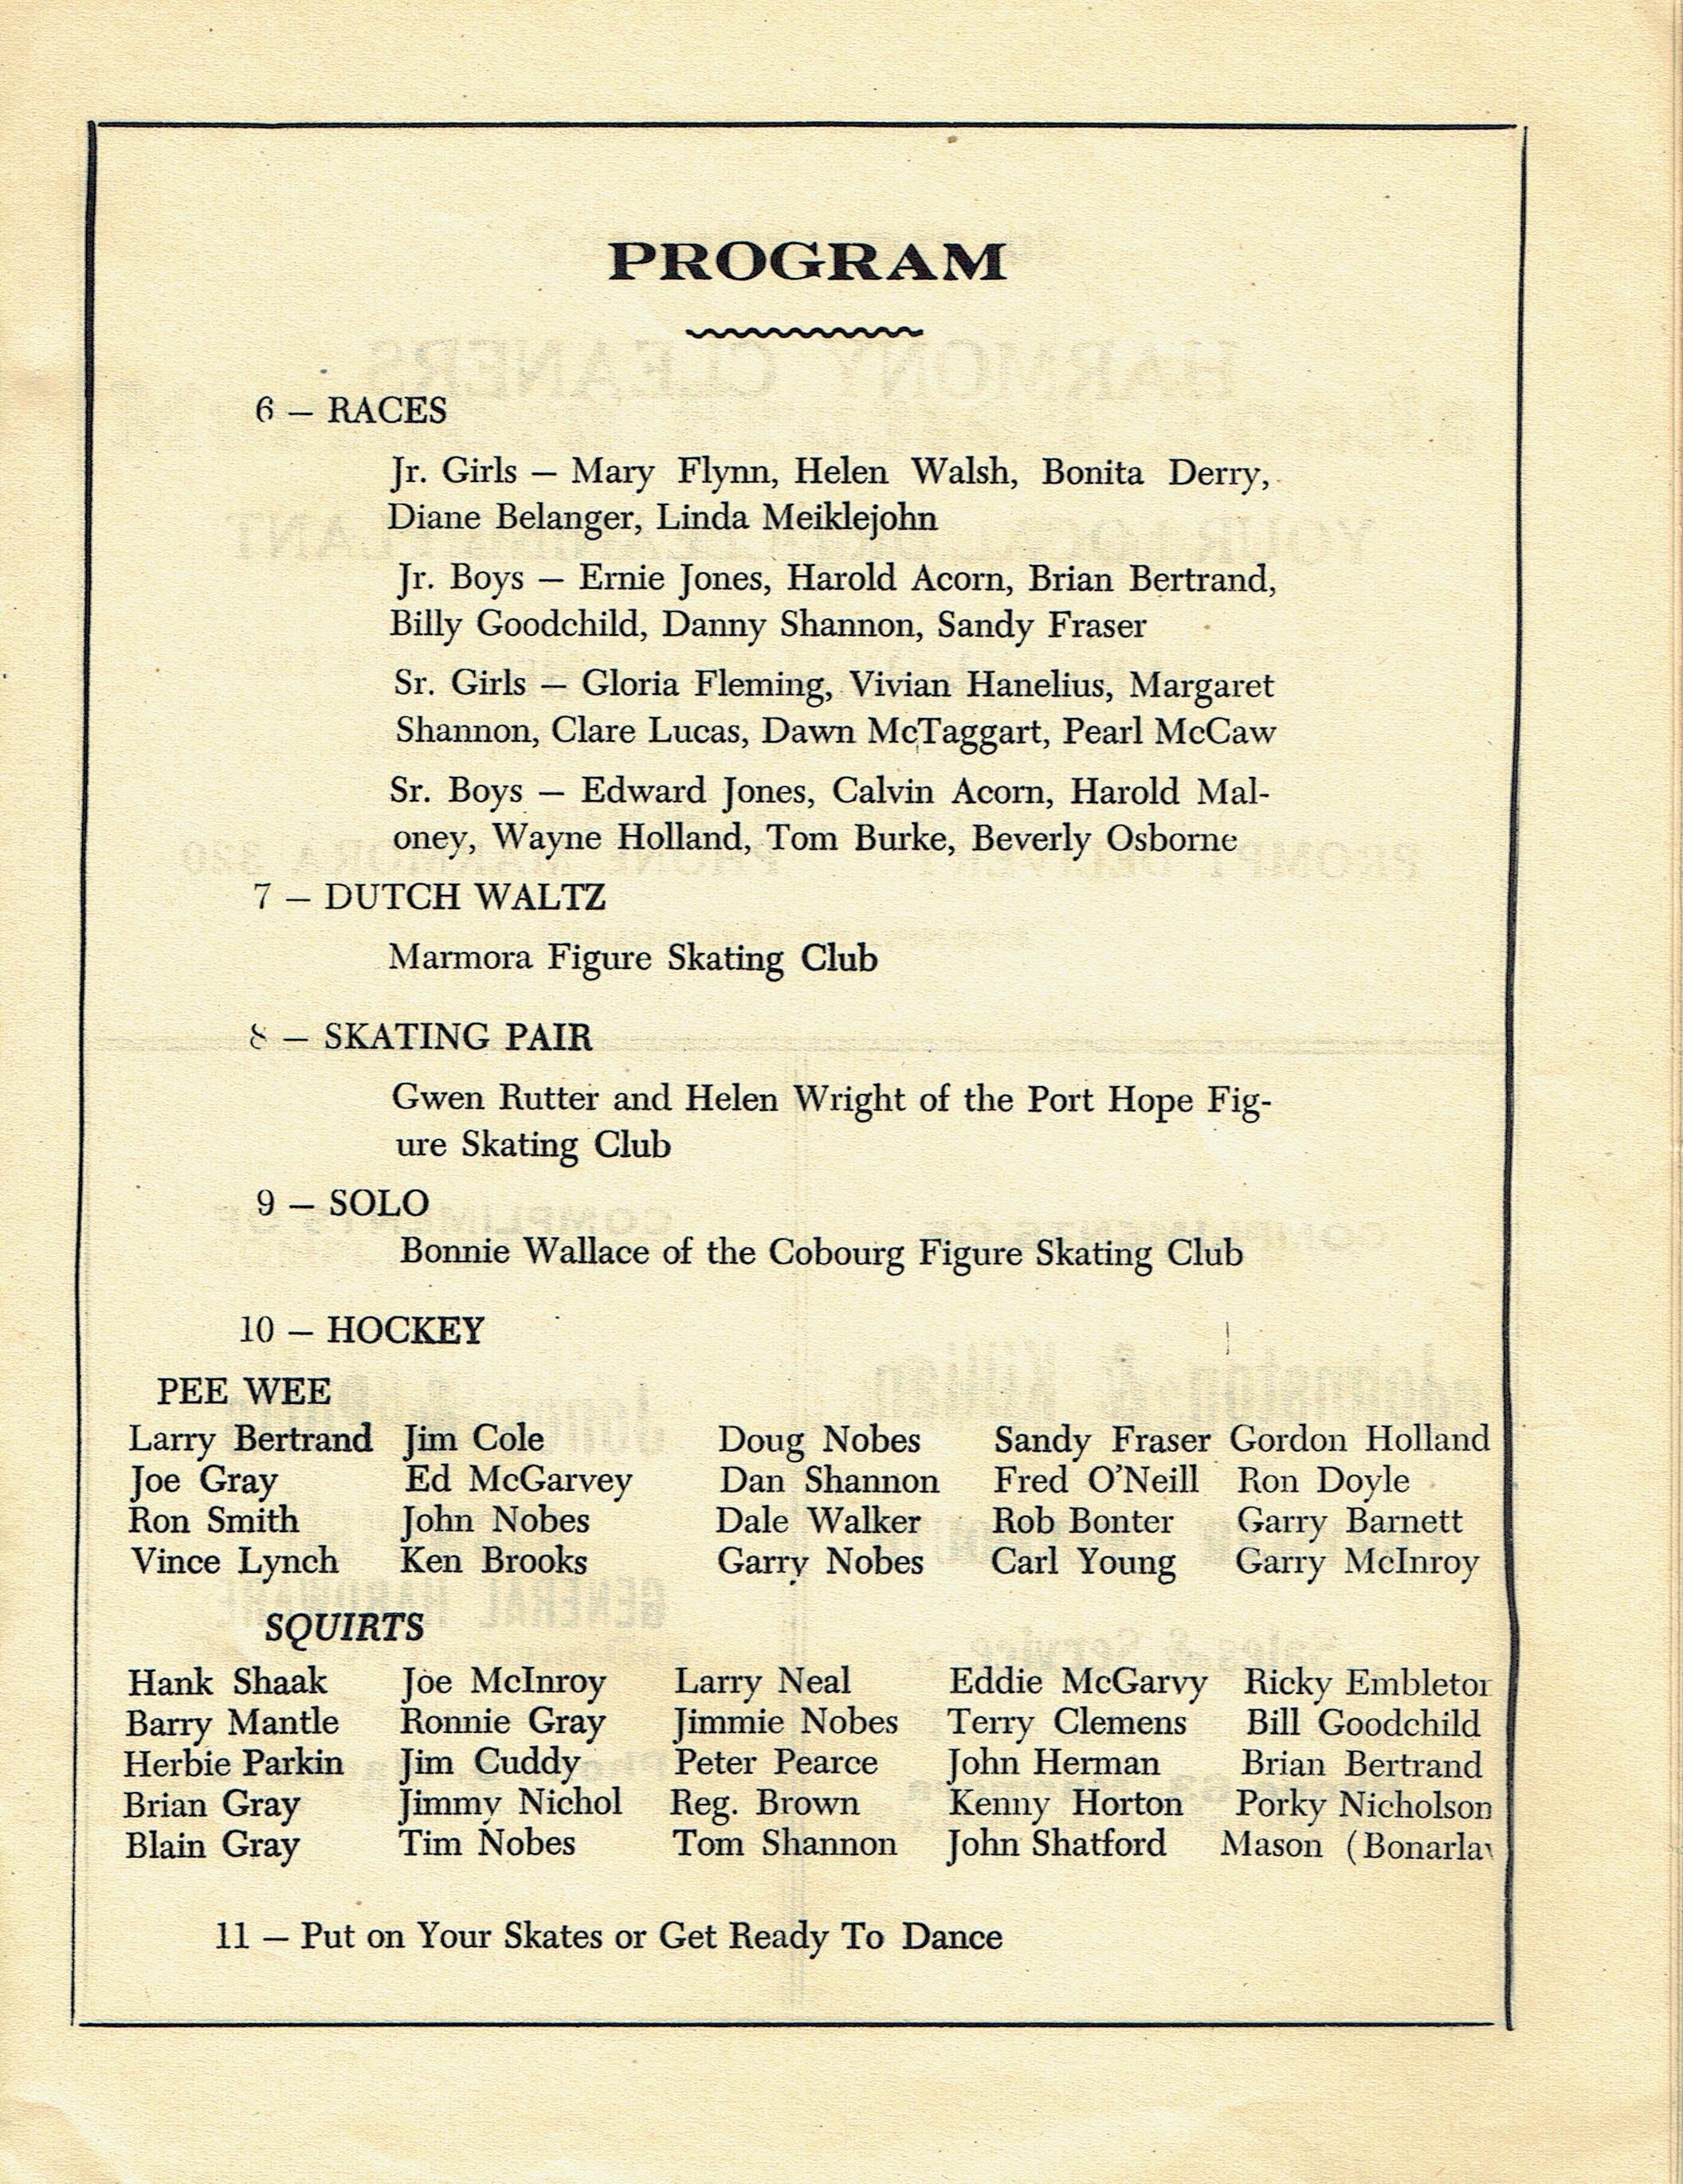 1955 Figure skating Club (4).jpg